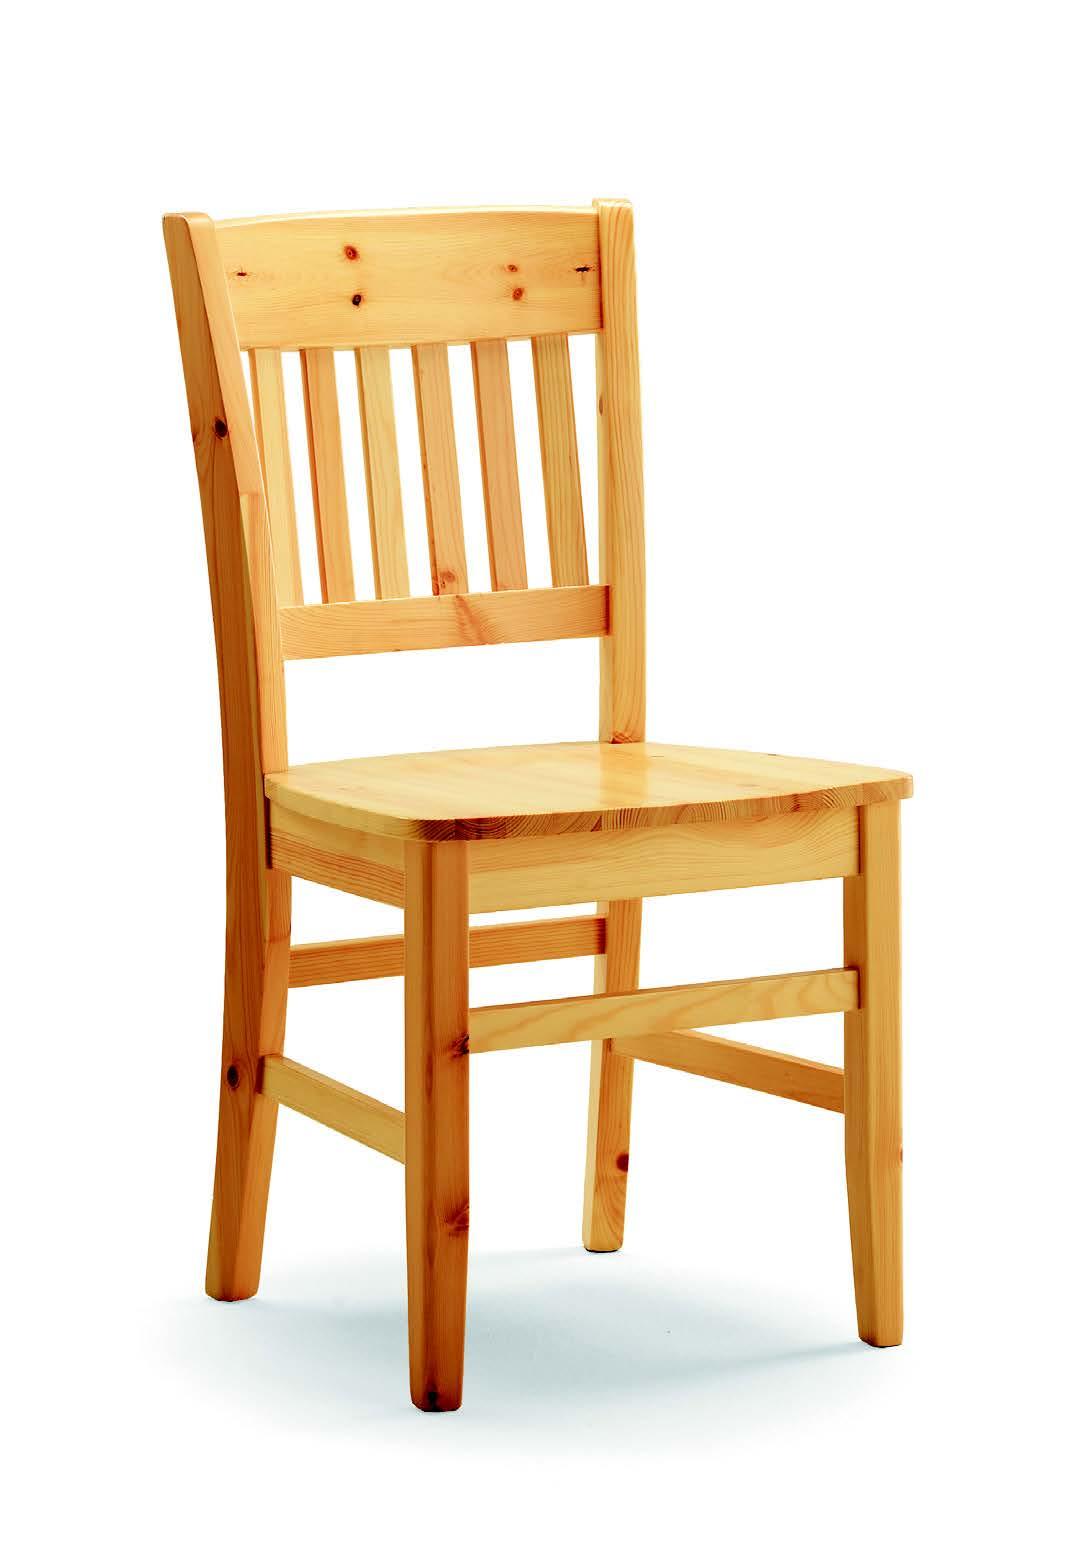 Sedia in pino veronica galimberti sedie e tavoli for Galimberti sedie